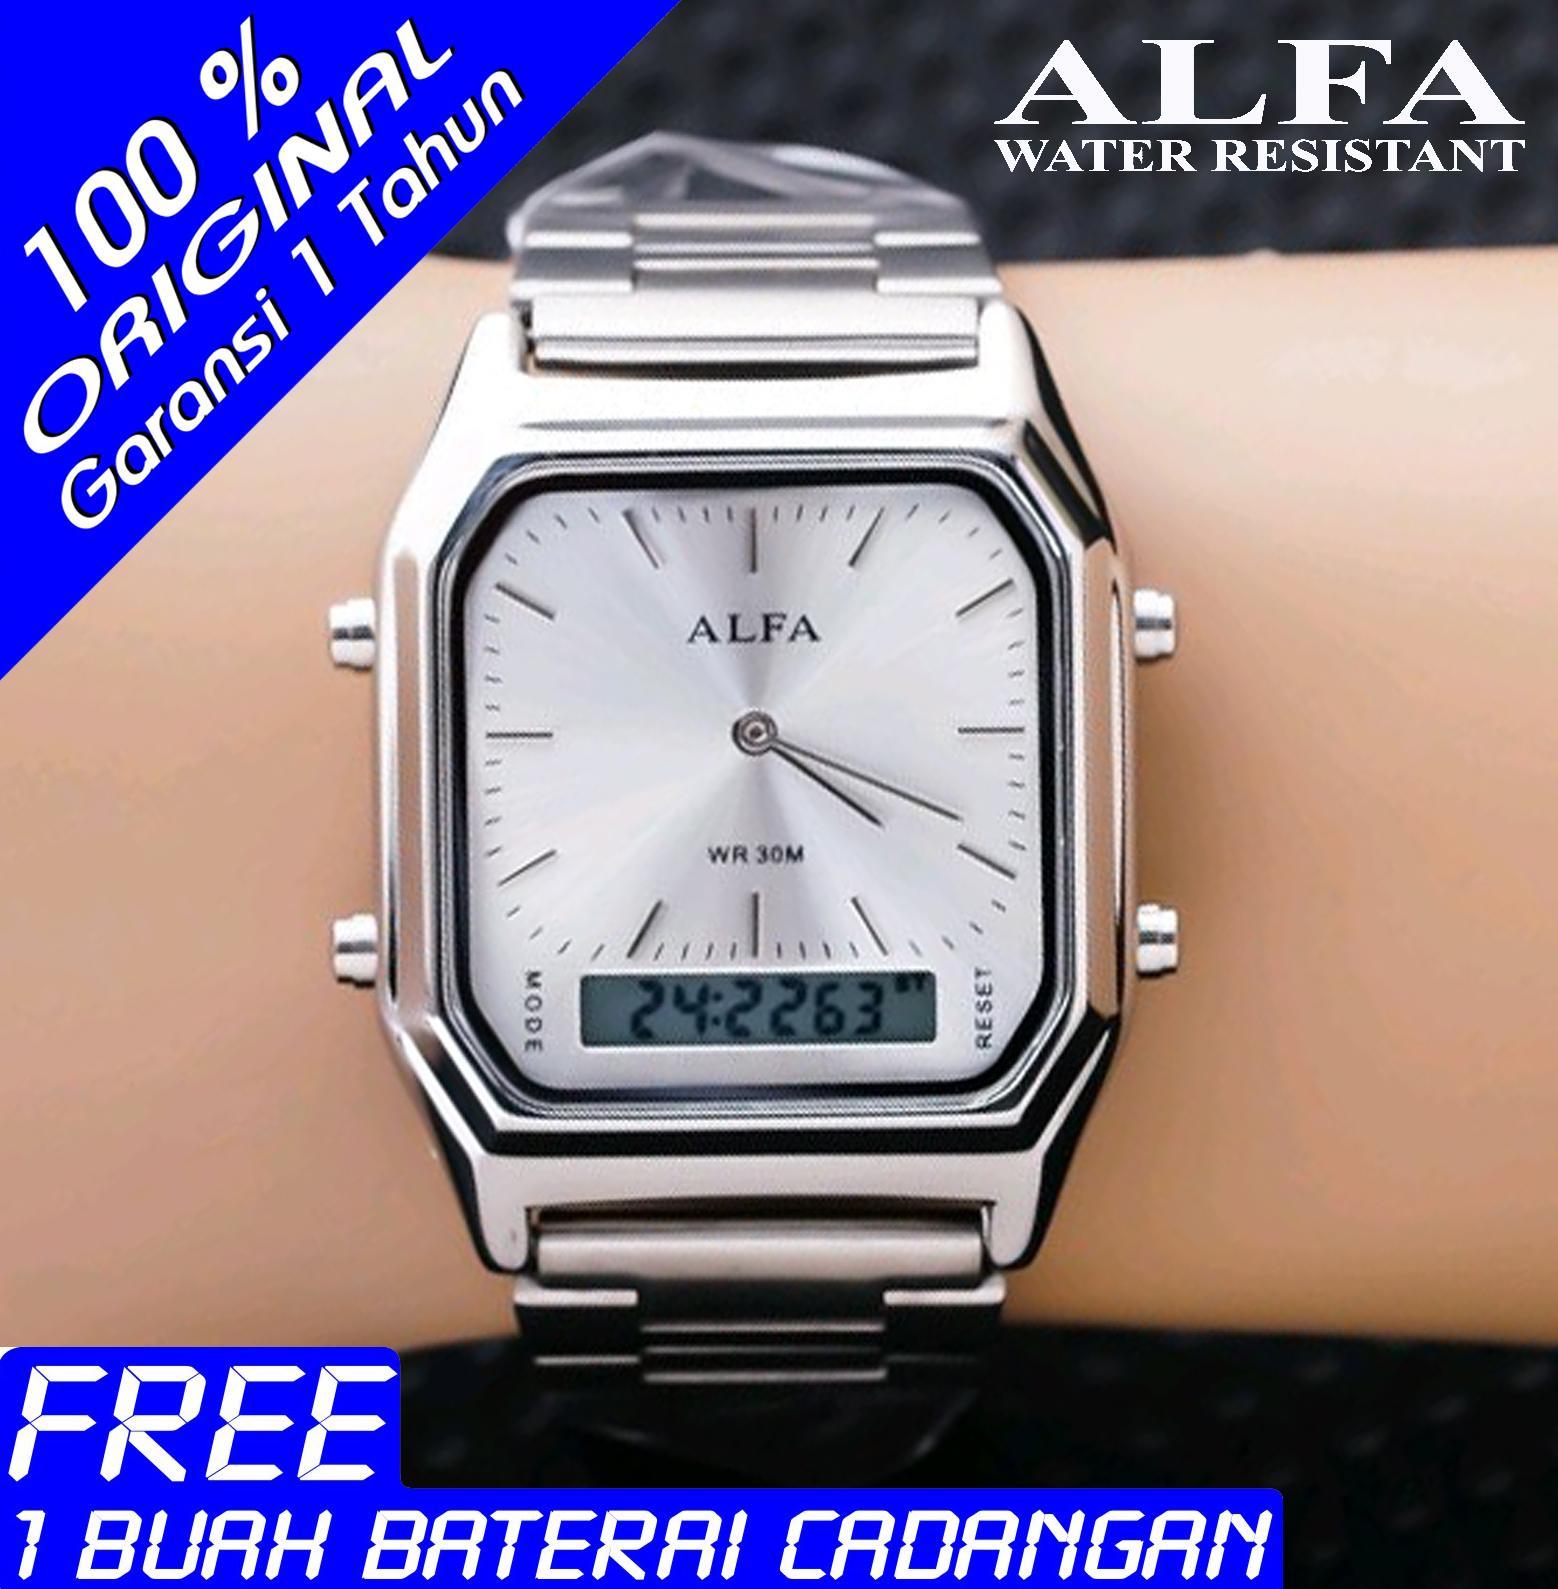 Alfa Dual Time - Jam Tangan Wanita - W 8003 - Stainlesstell Strap Rantai